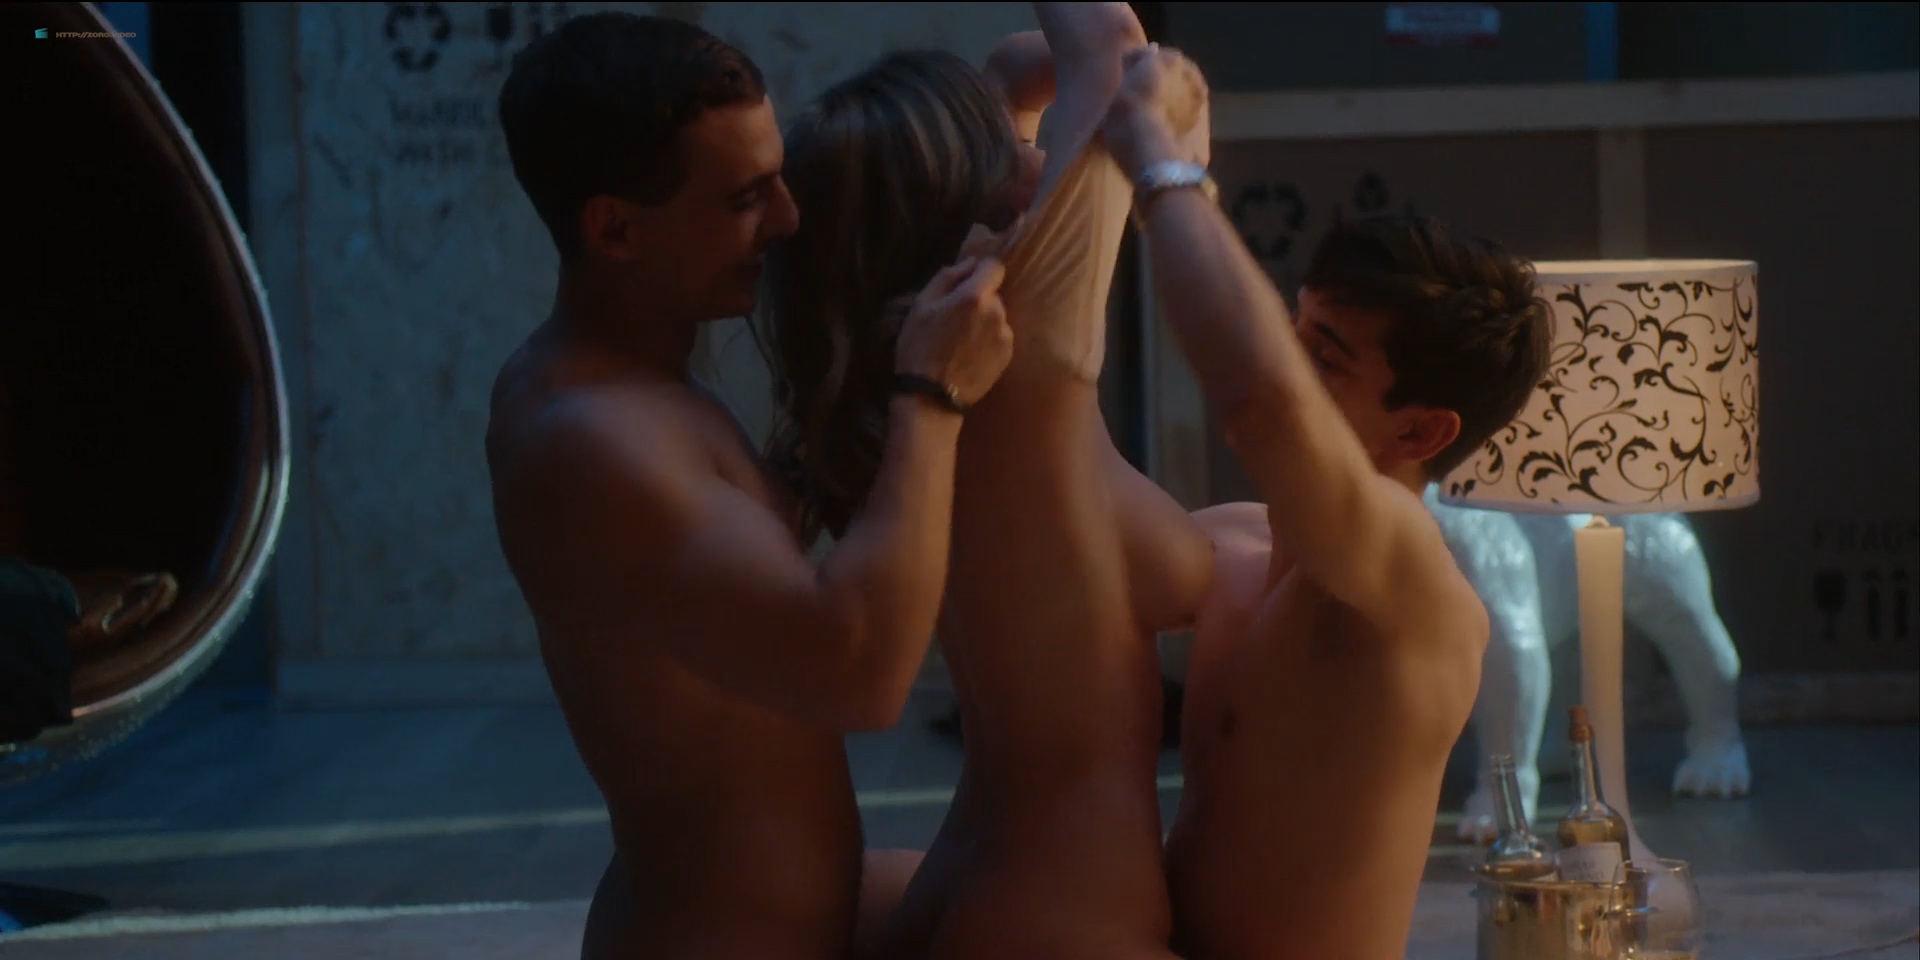 Sex Maria Pedraza nudes (23 photos), Ass, Fappening, Boobs, lingerie 2020